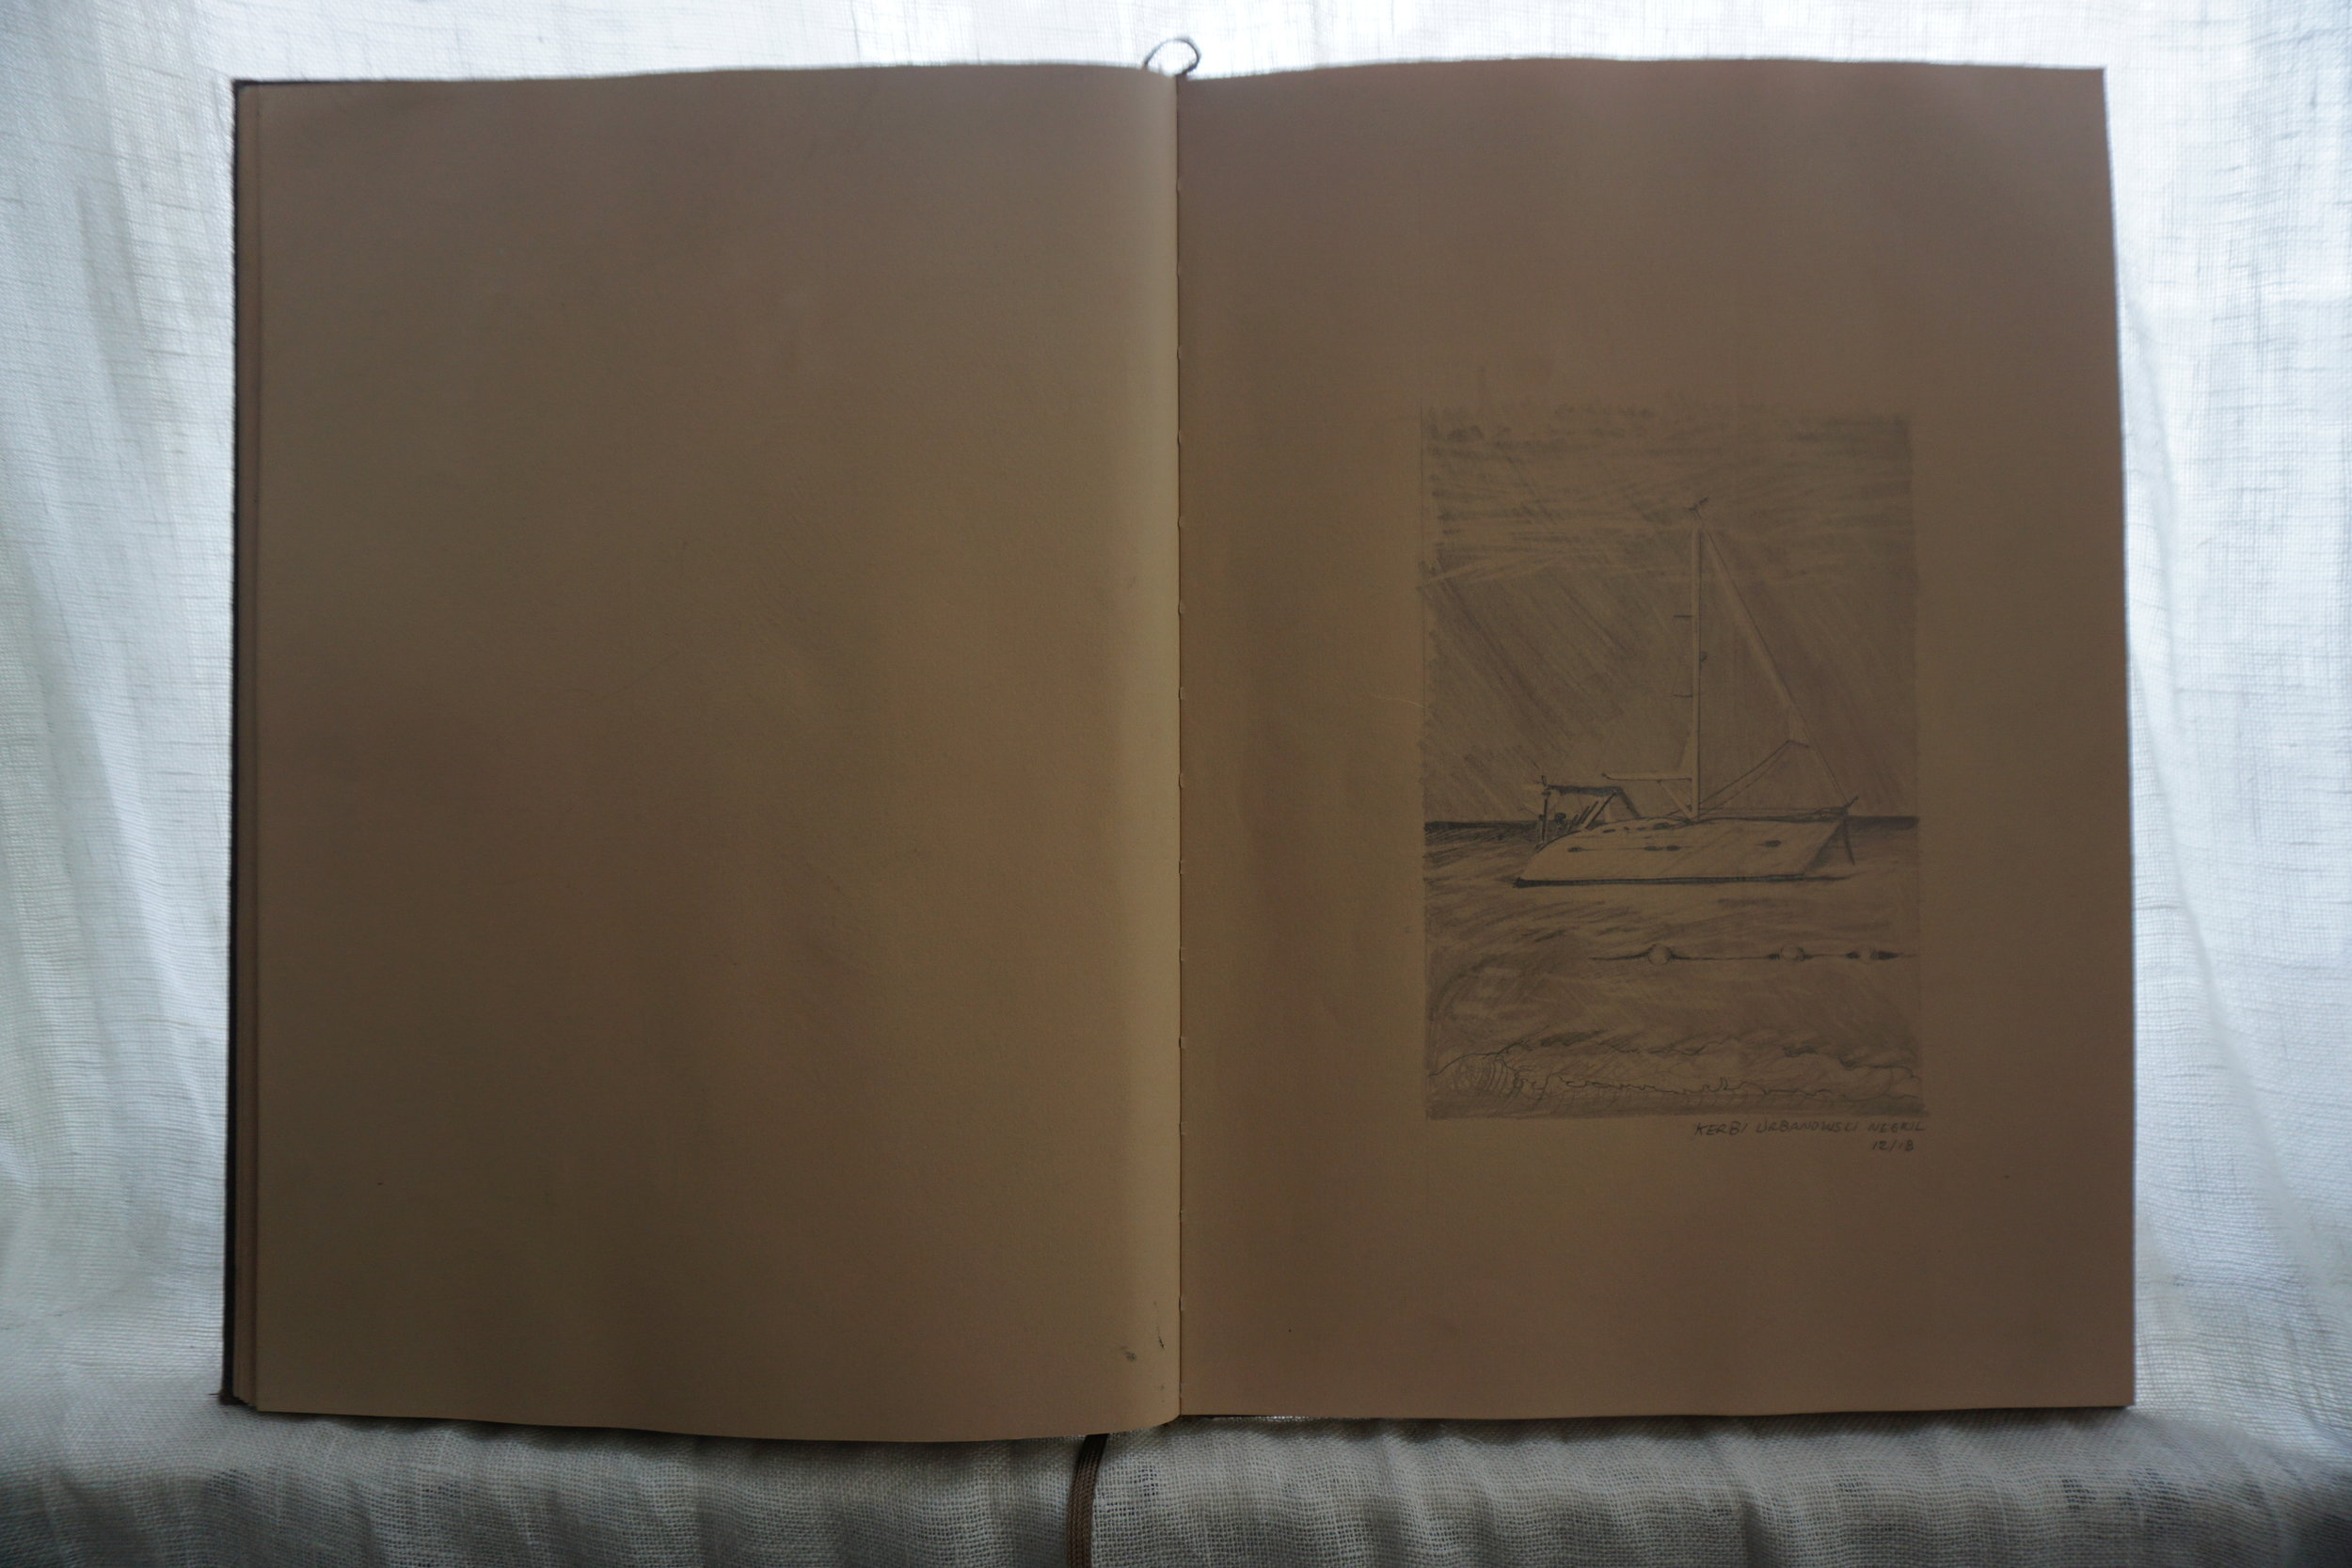 kerbi-urbanowski-catamaran-sketchbook-negril-december